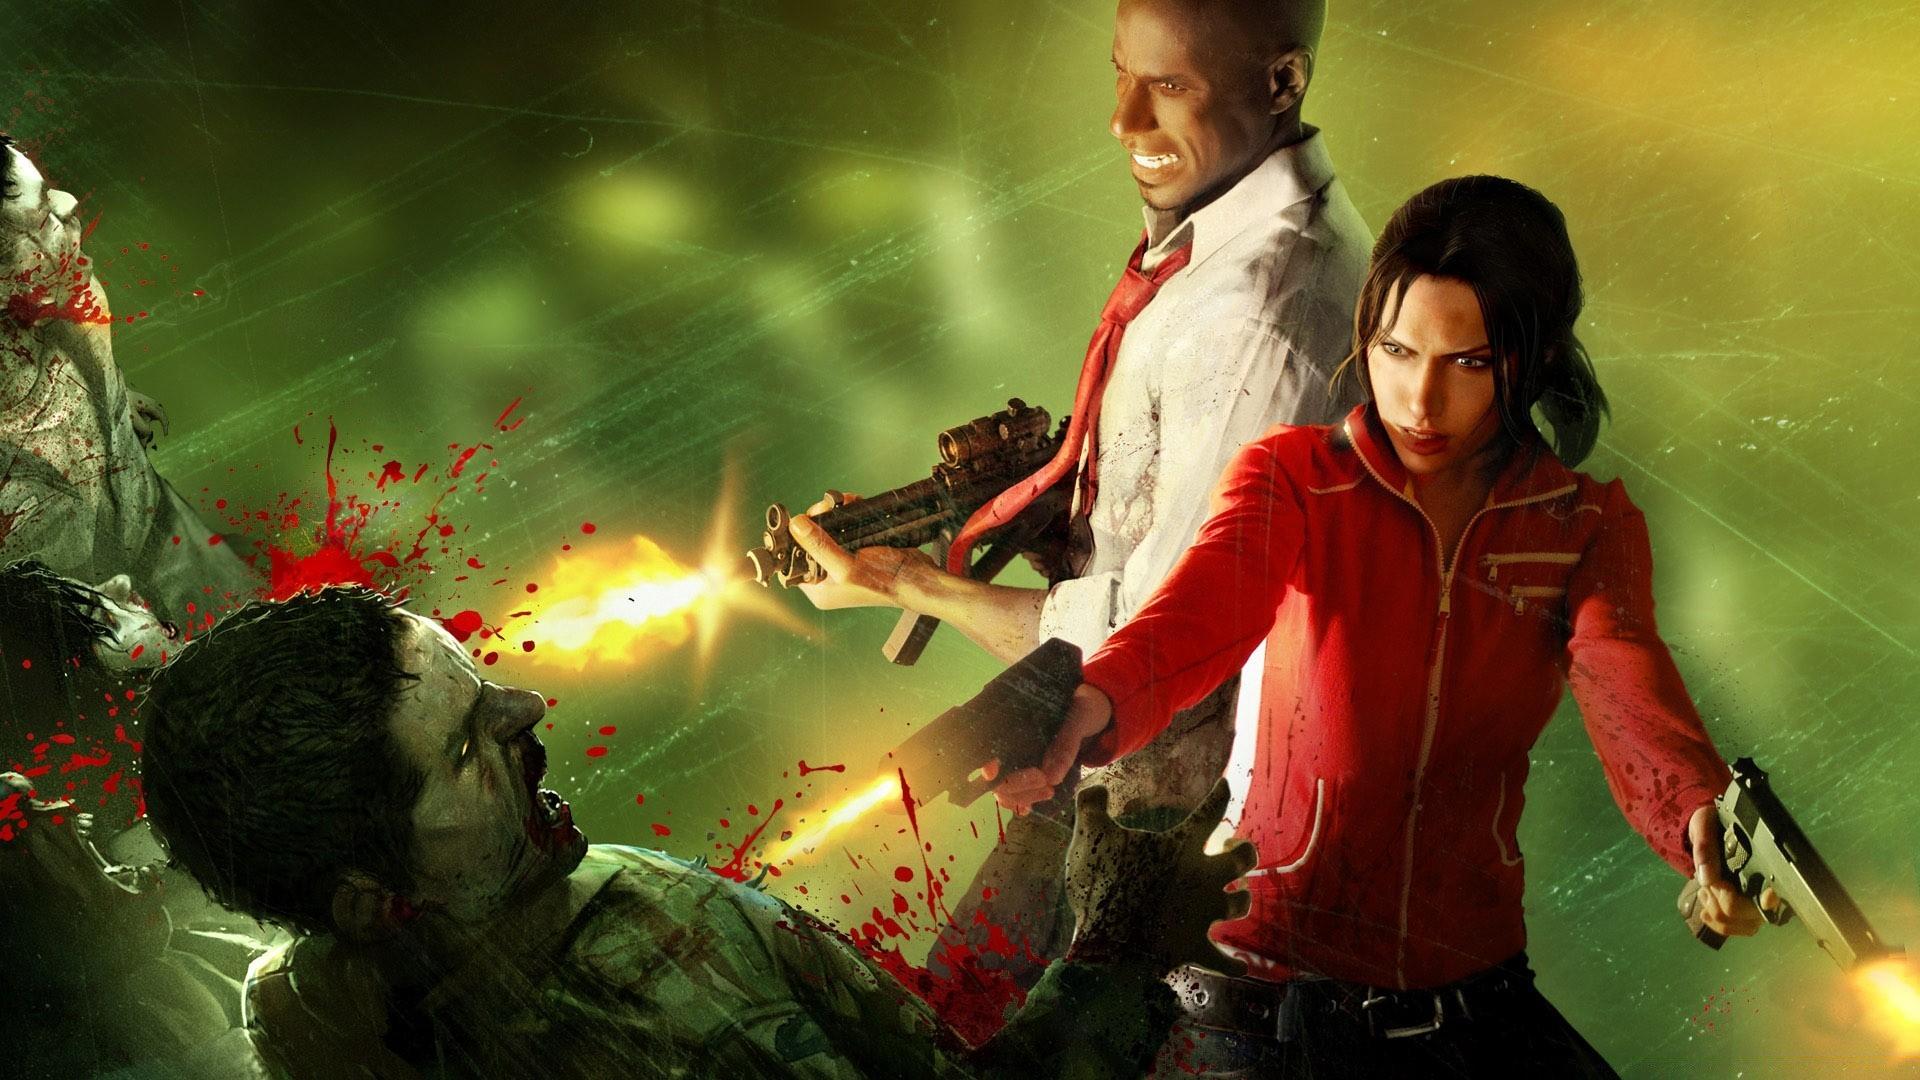 Dying Light sur PlayStation 4 Liste de jeux Xbox 360 Wikipdia Gameloft Video Game Developer Worldwide